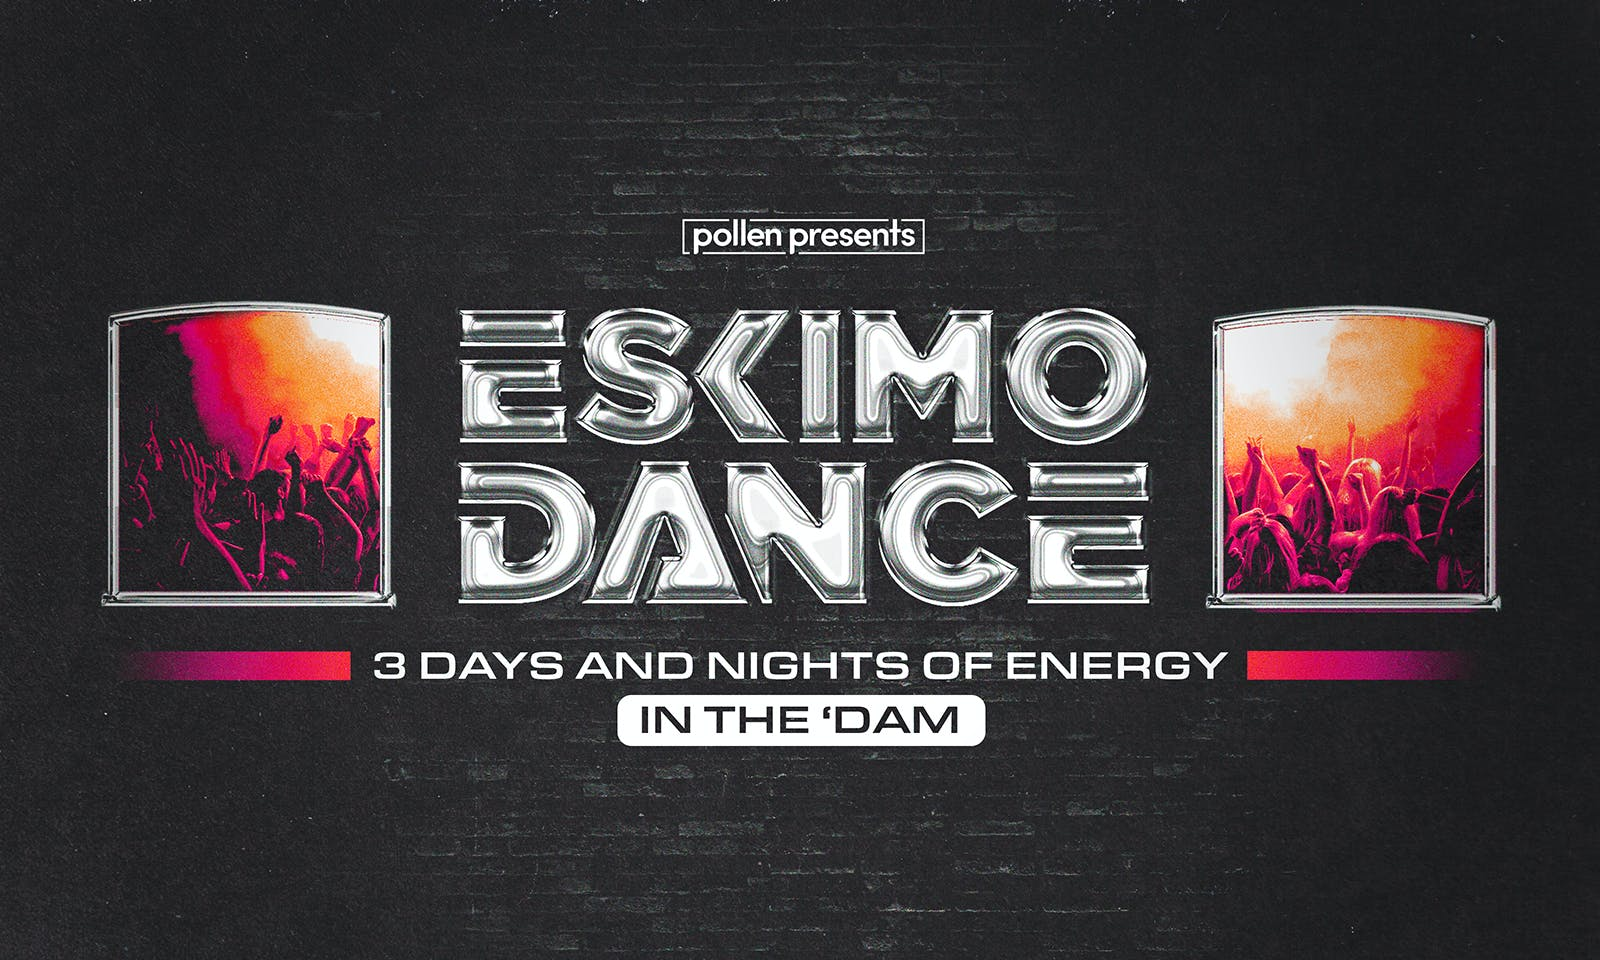 Eskimo dance promo poster